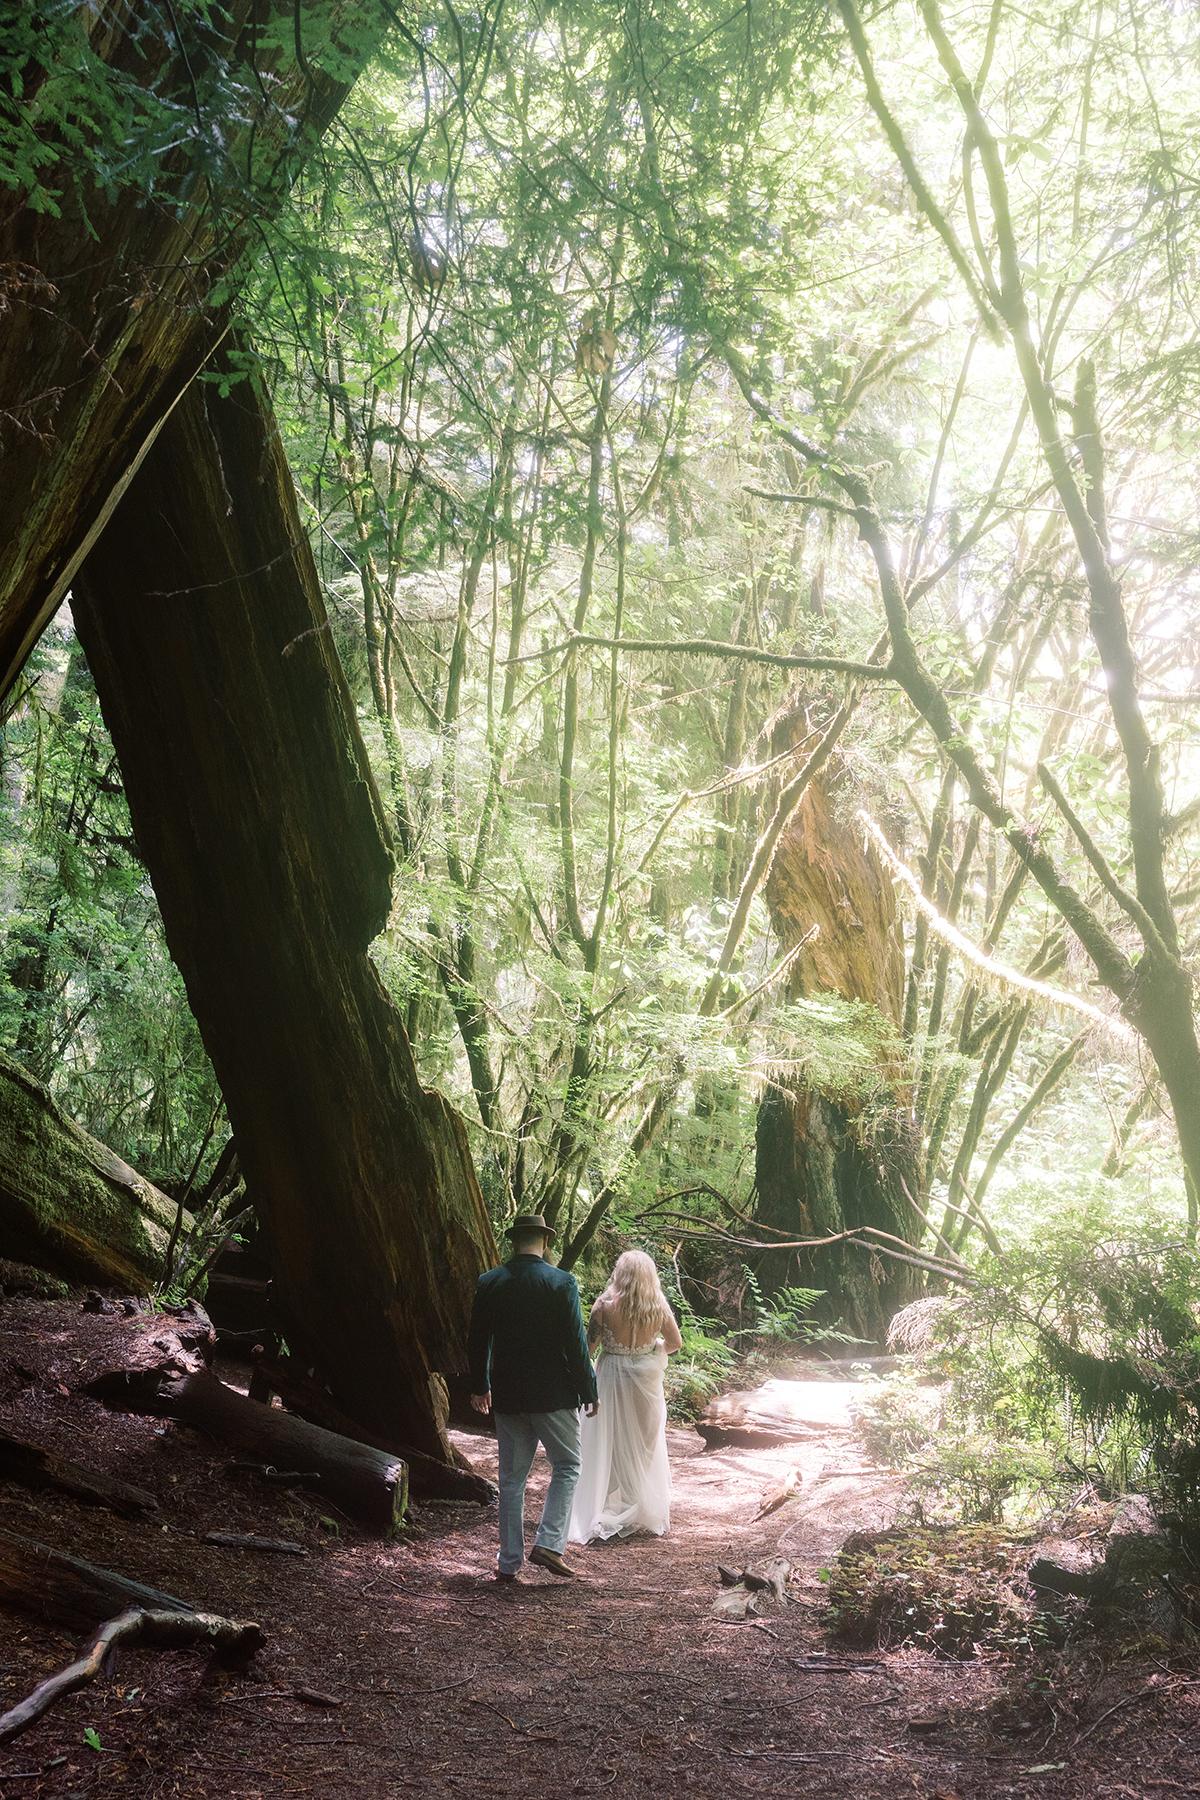 Prairie-Creek-Redwoods-State-Park-wedding-elopement-photos-10